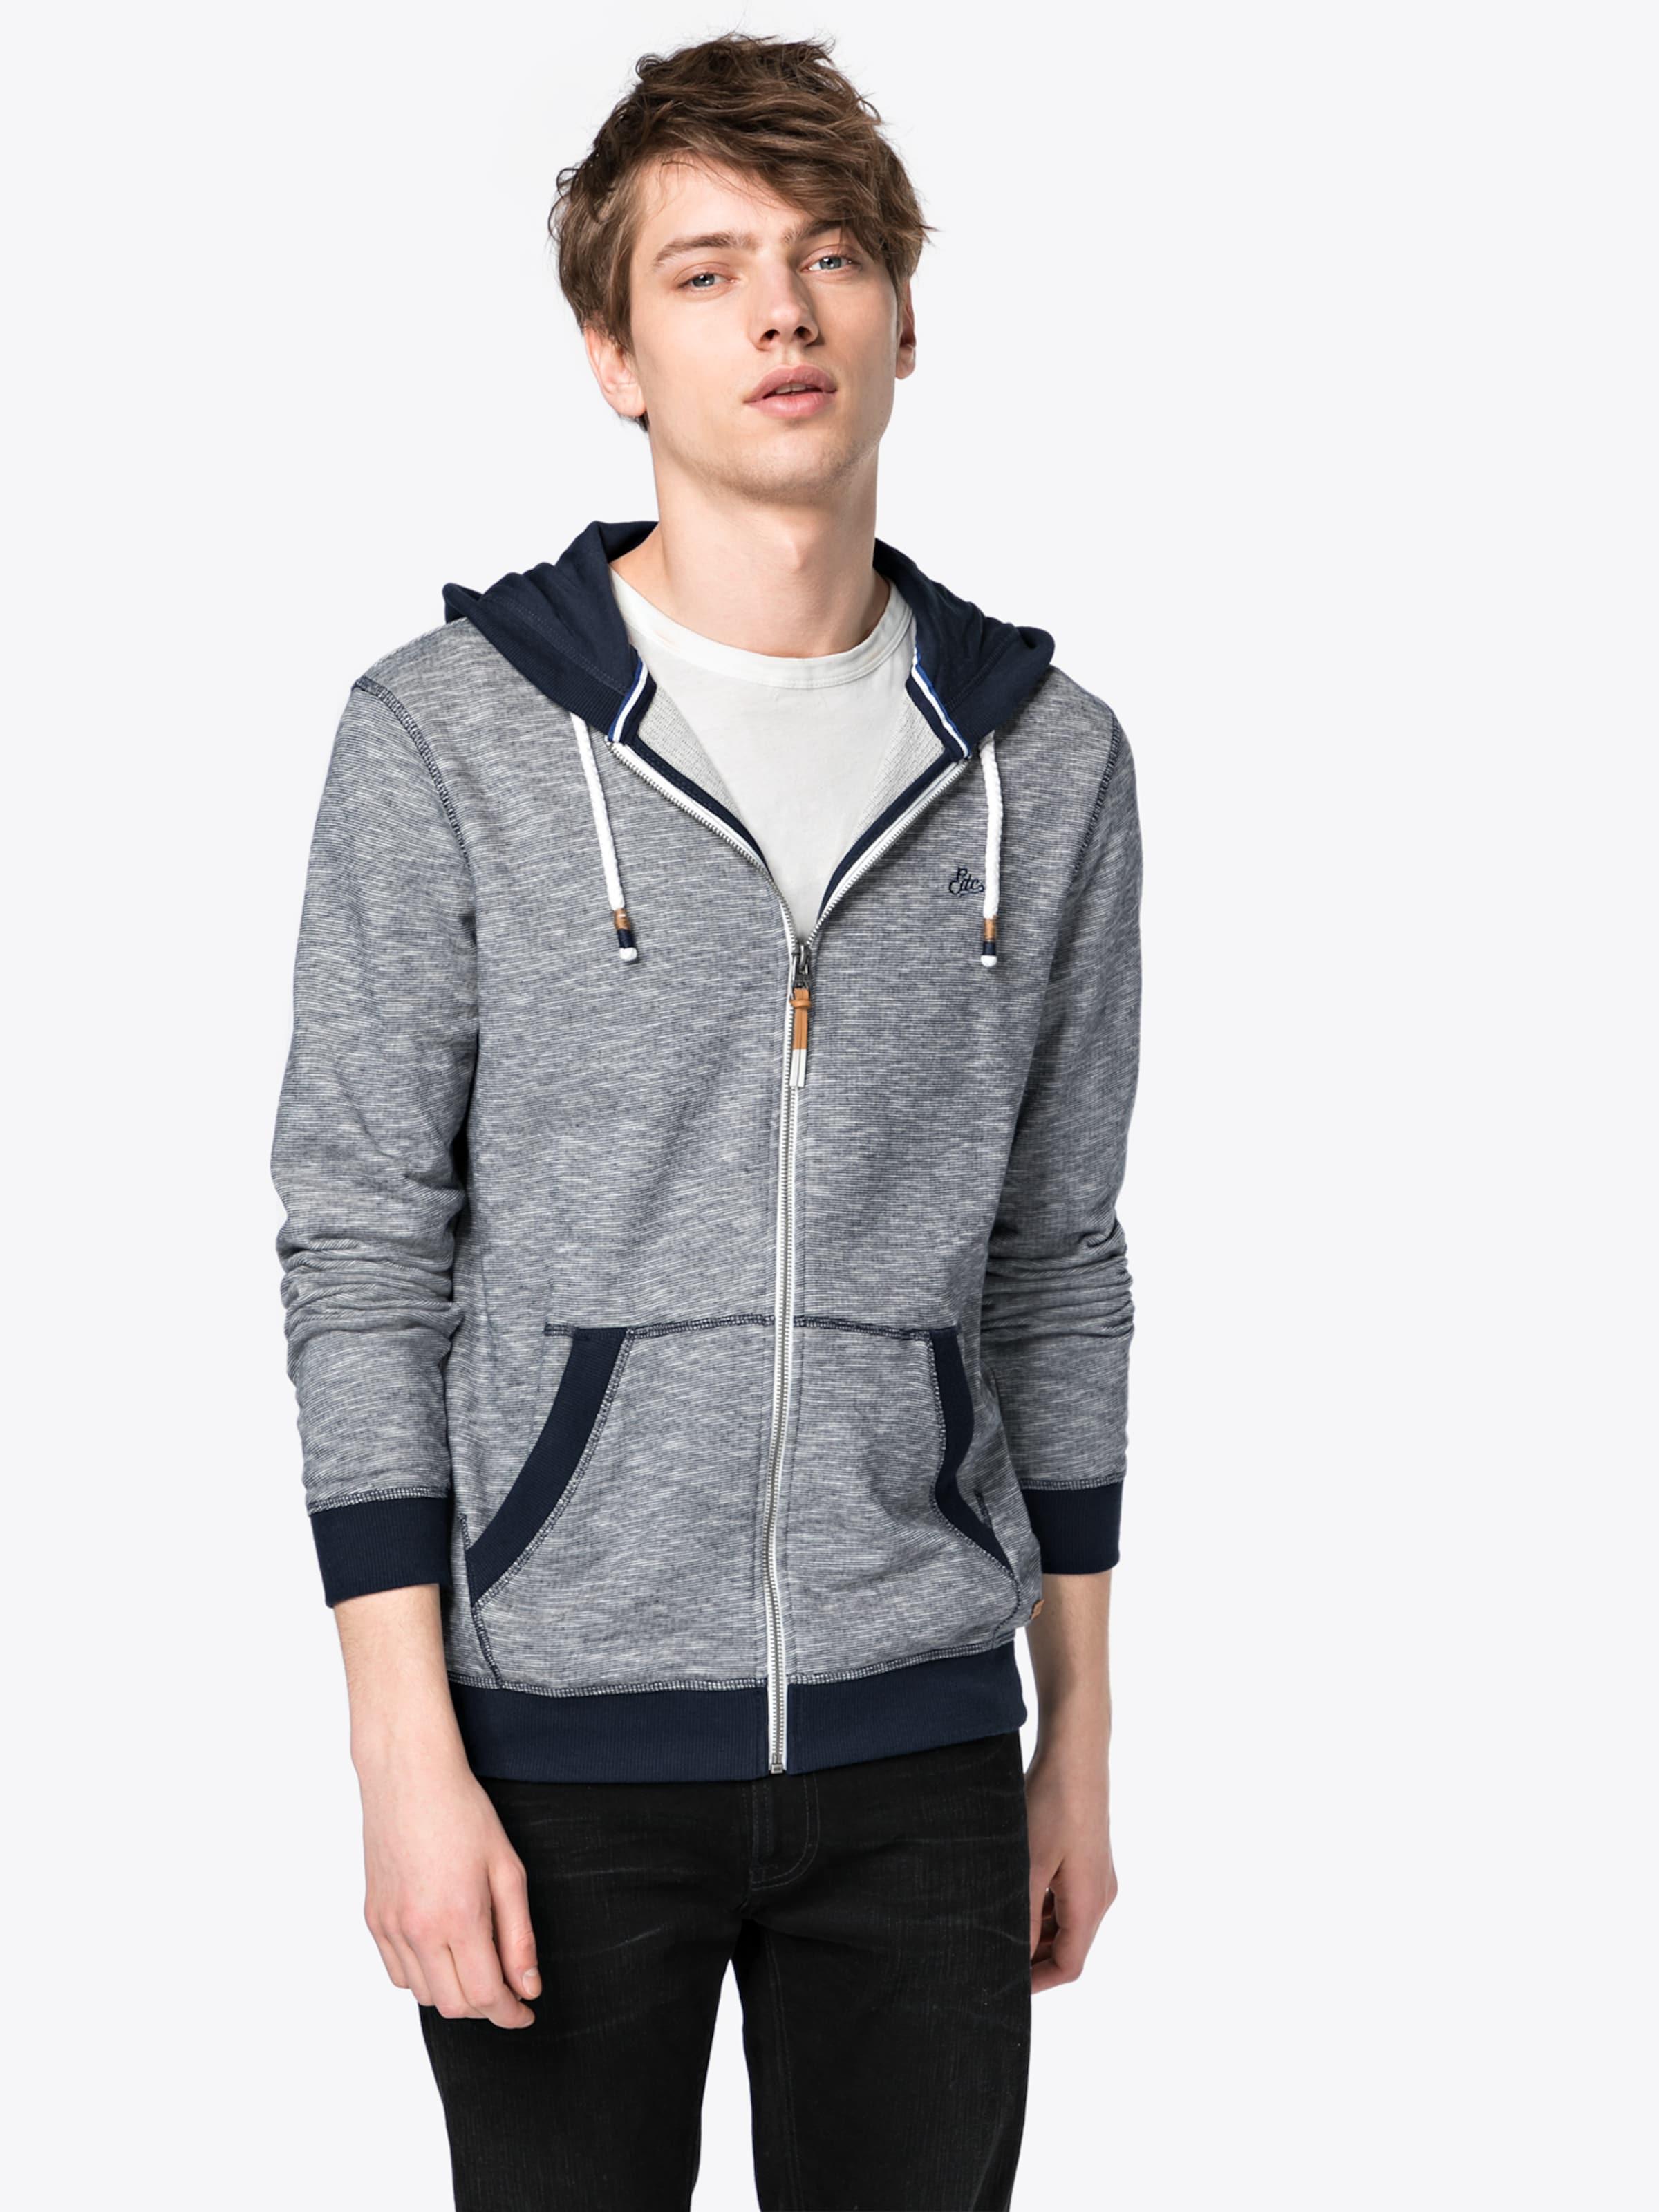 'feeder EDC BY Sweatshirts zpthrouh sleeve' long cardigan Sweatjacke ESPRIT F1tqw1gC